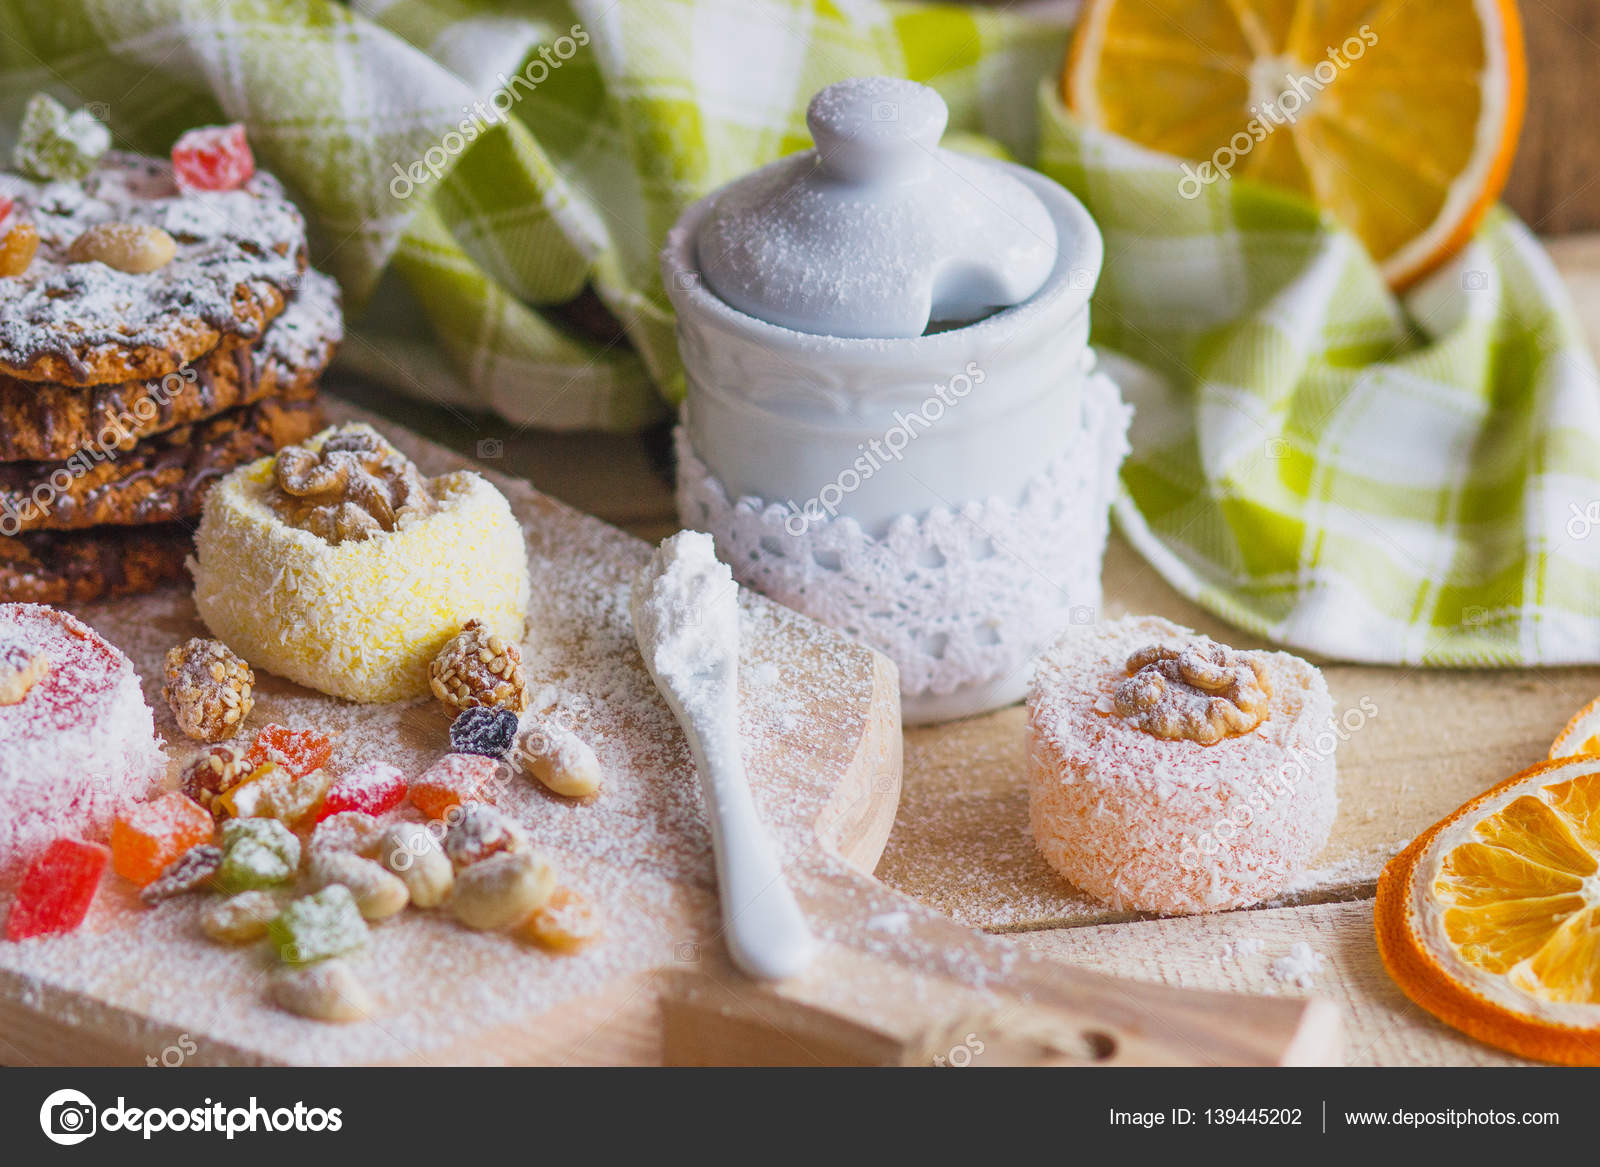 Şekeri Kesin Rahat Edin